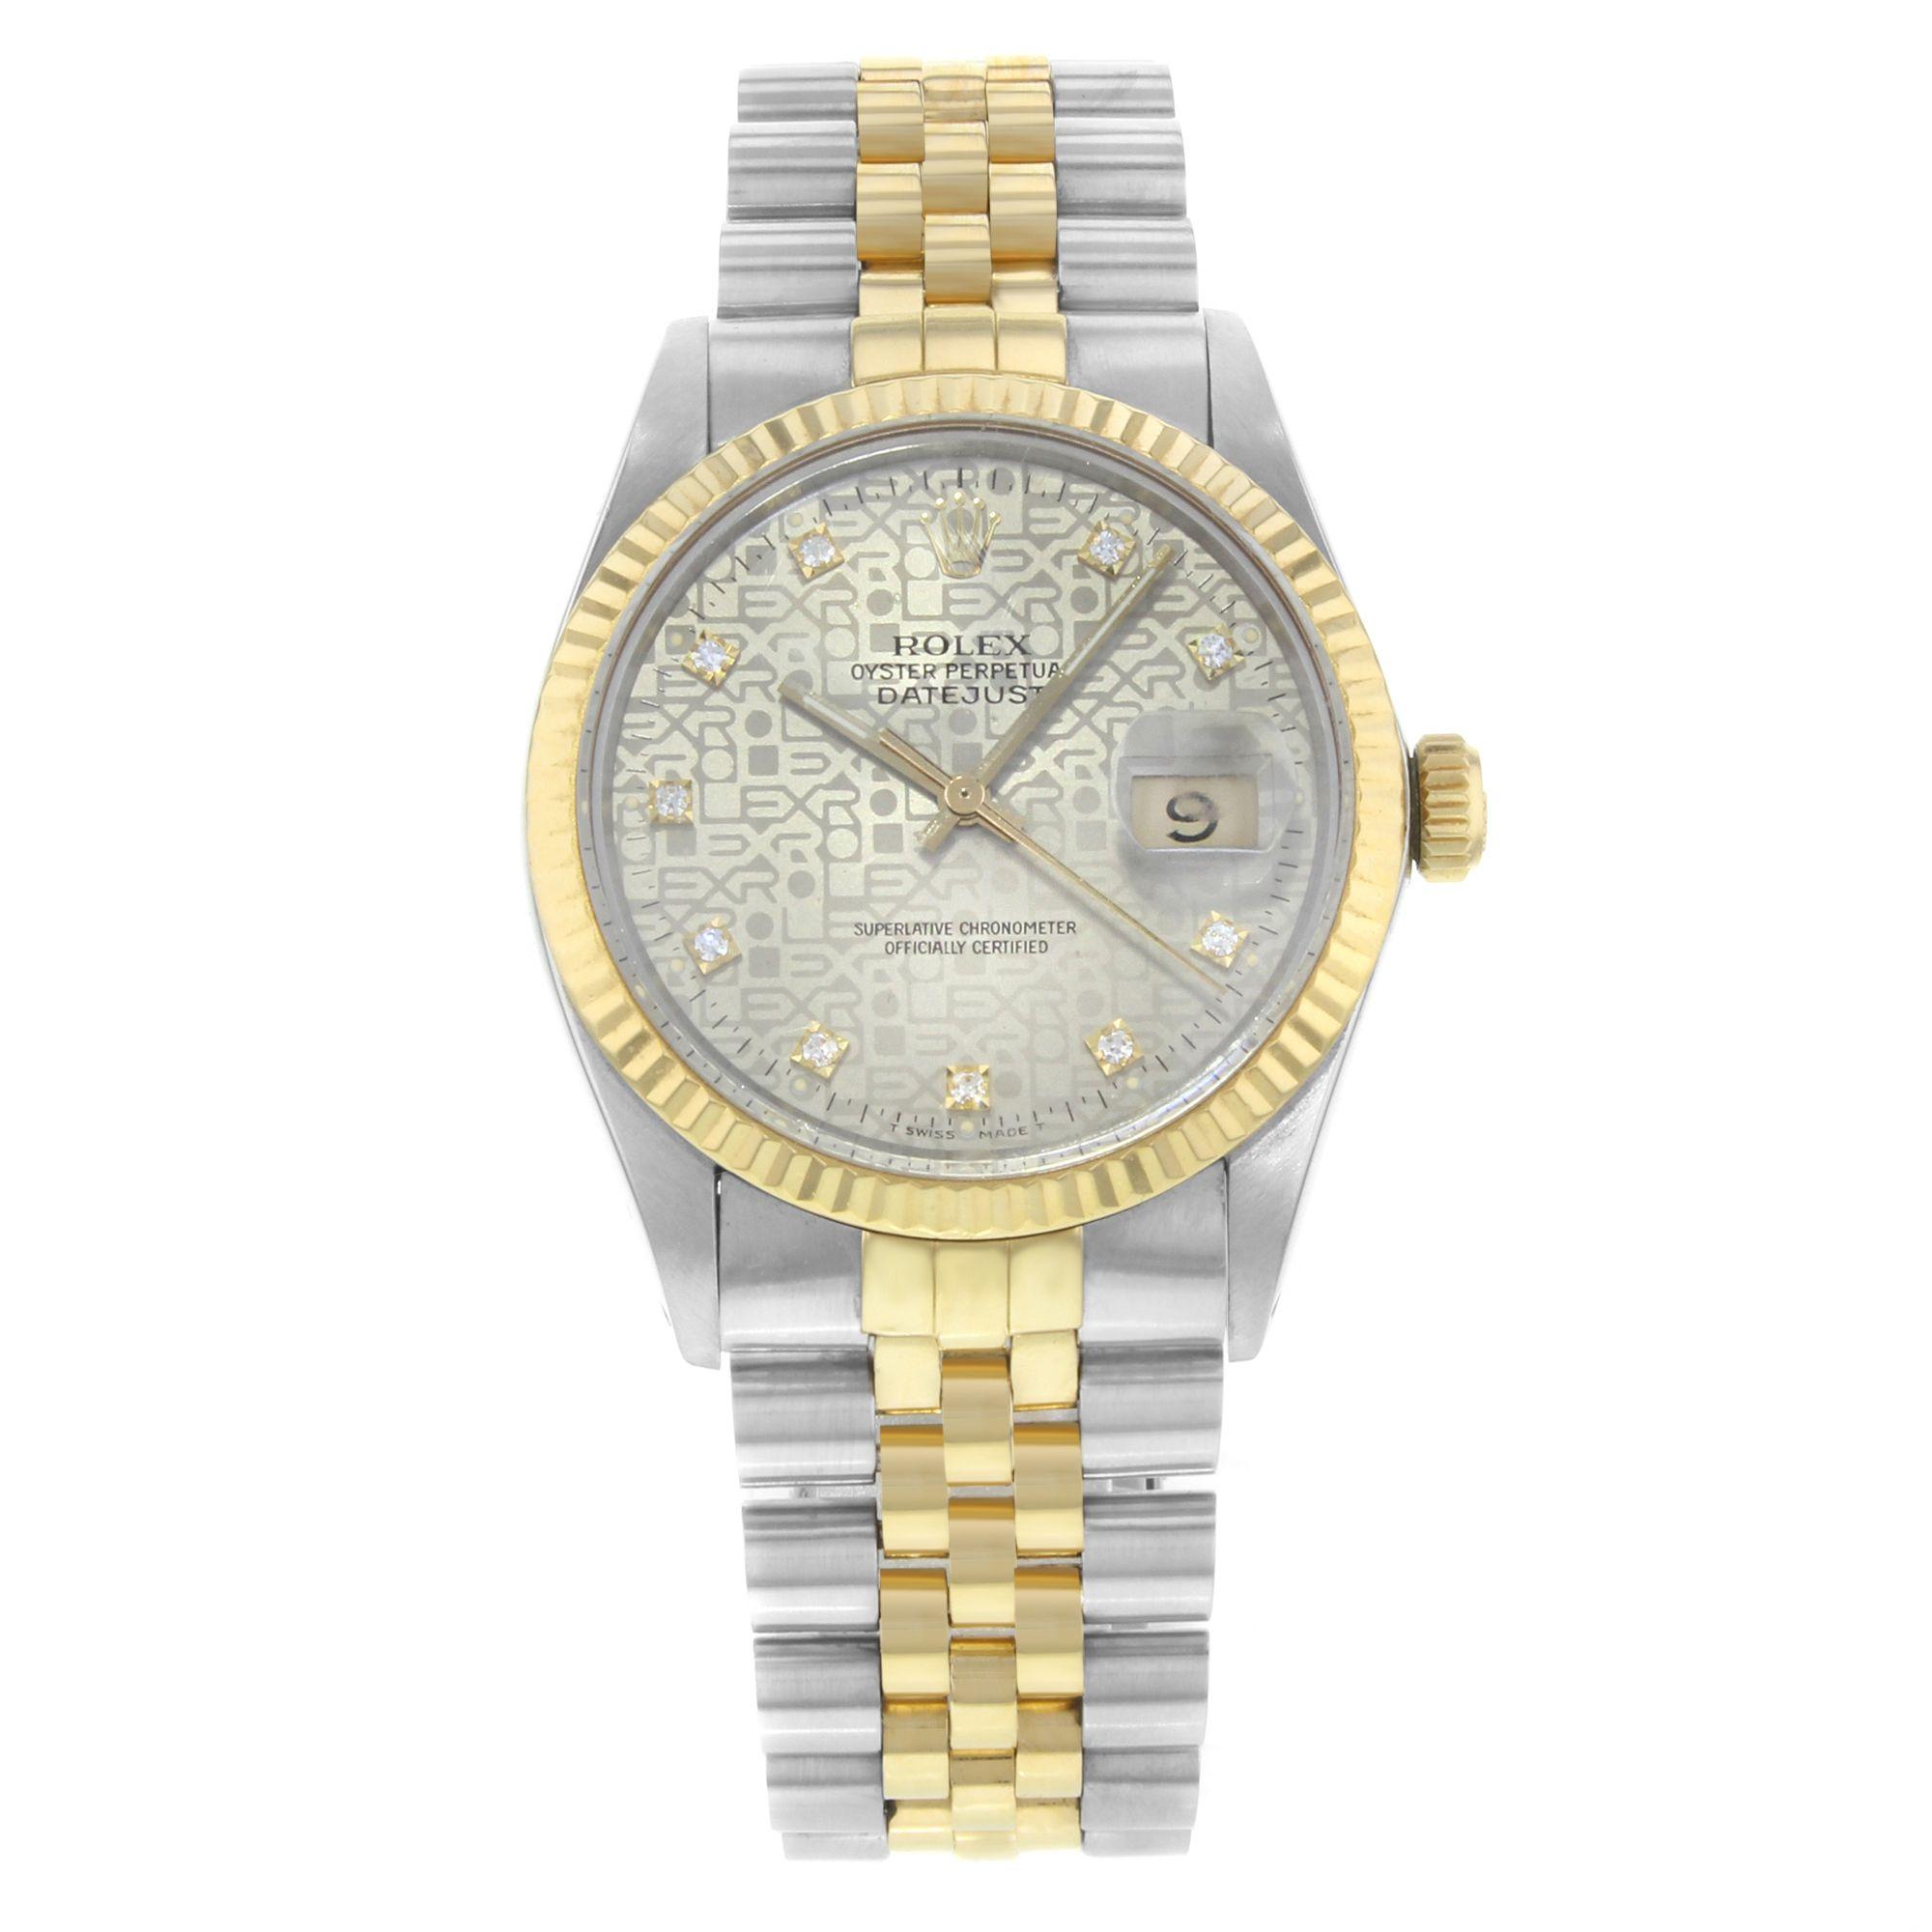 Rolex Datejust 16013 18K Yellow Gold & Steel Automatic Men's Watch